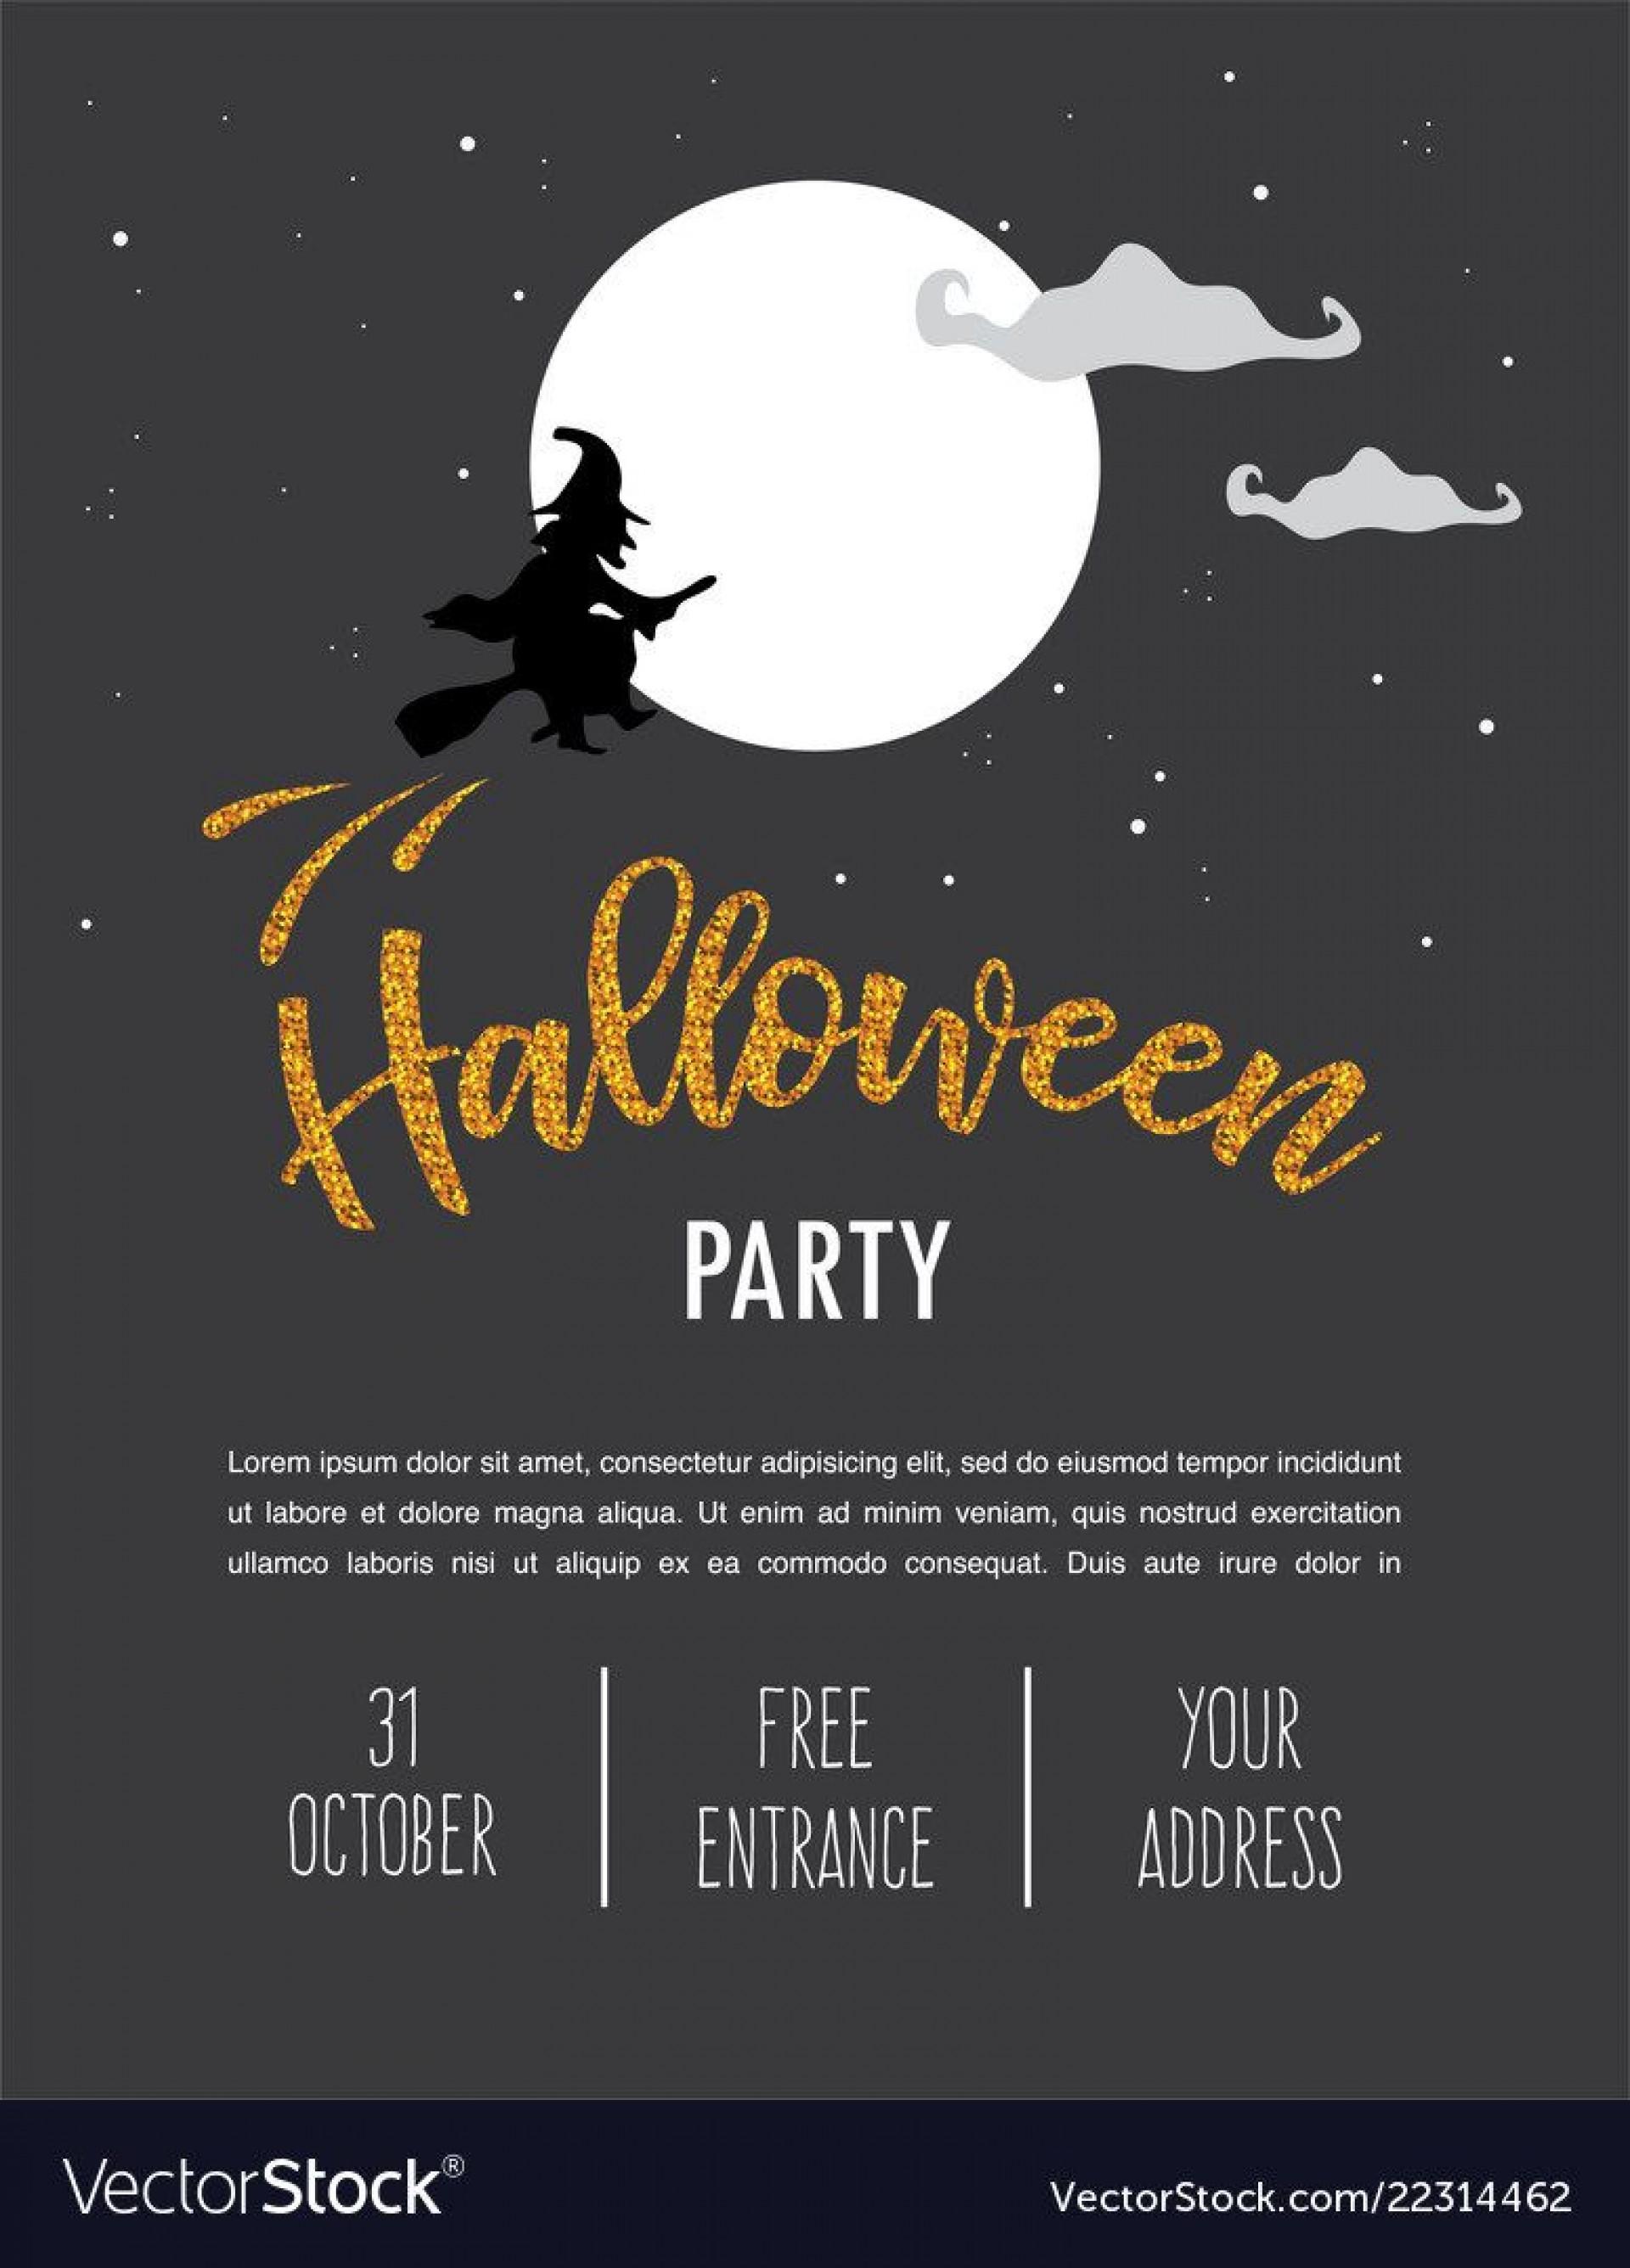 009 Rare Halloween Party Invite Template Image  Templates - Free Printable Spooky Invitation Birthday1920